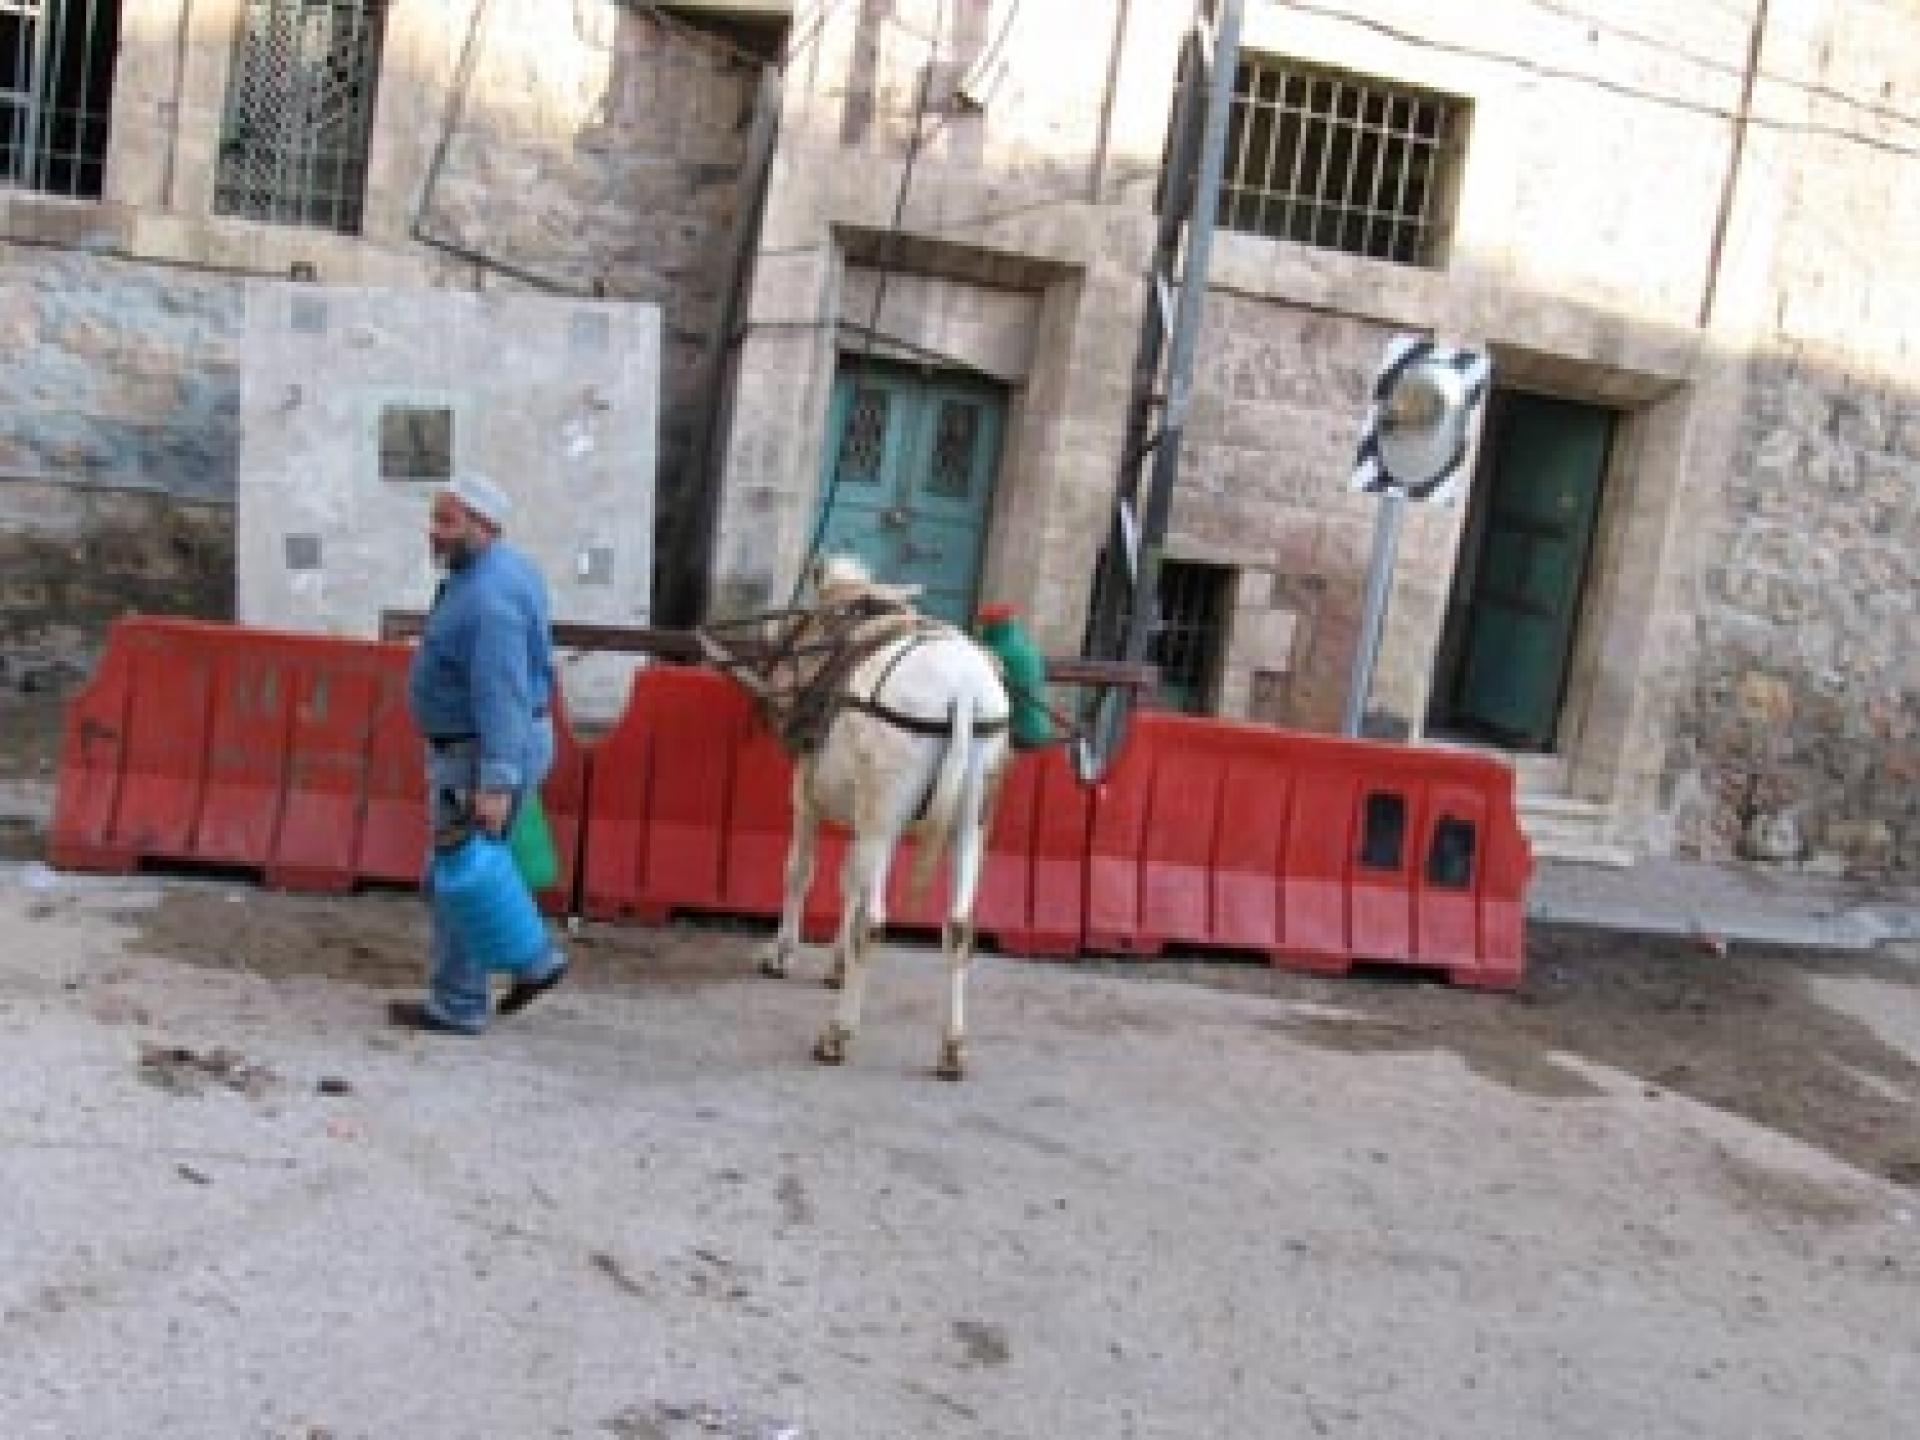 Hebron 17.11.05